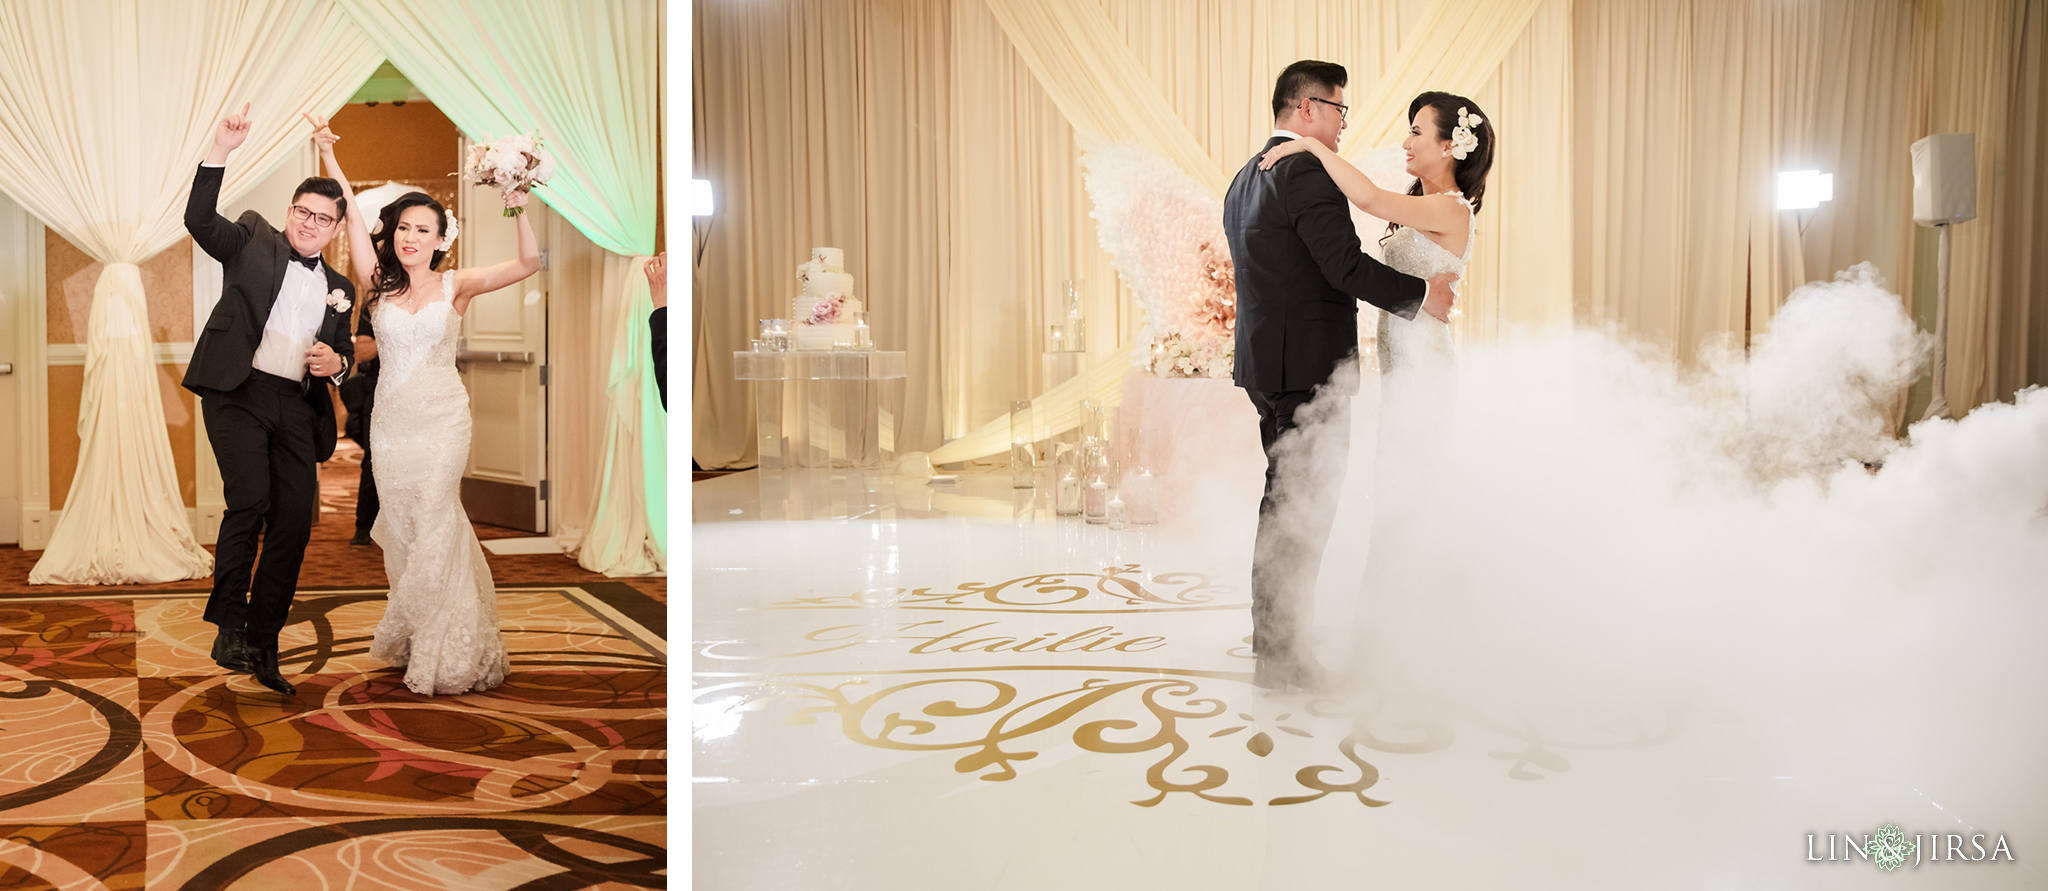 32 Hilton Anaheim Vietnamese Wedding Photography